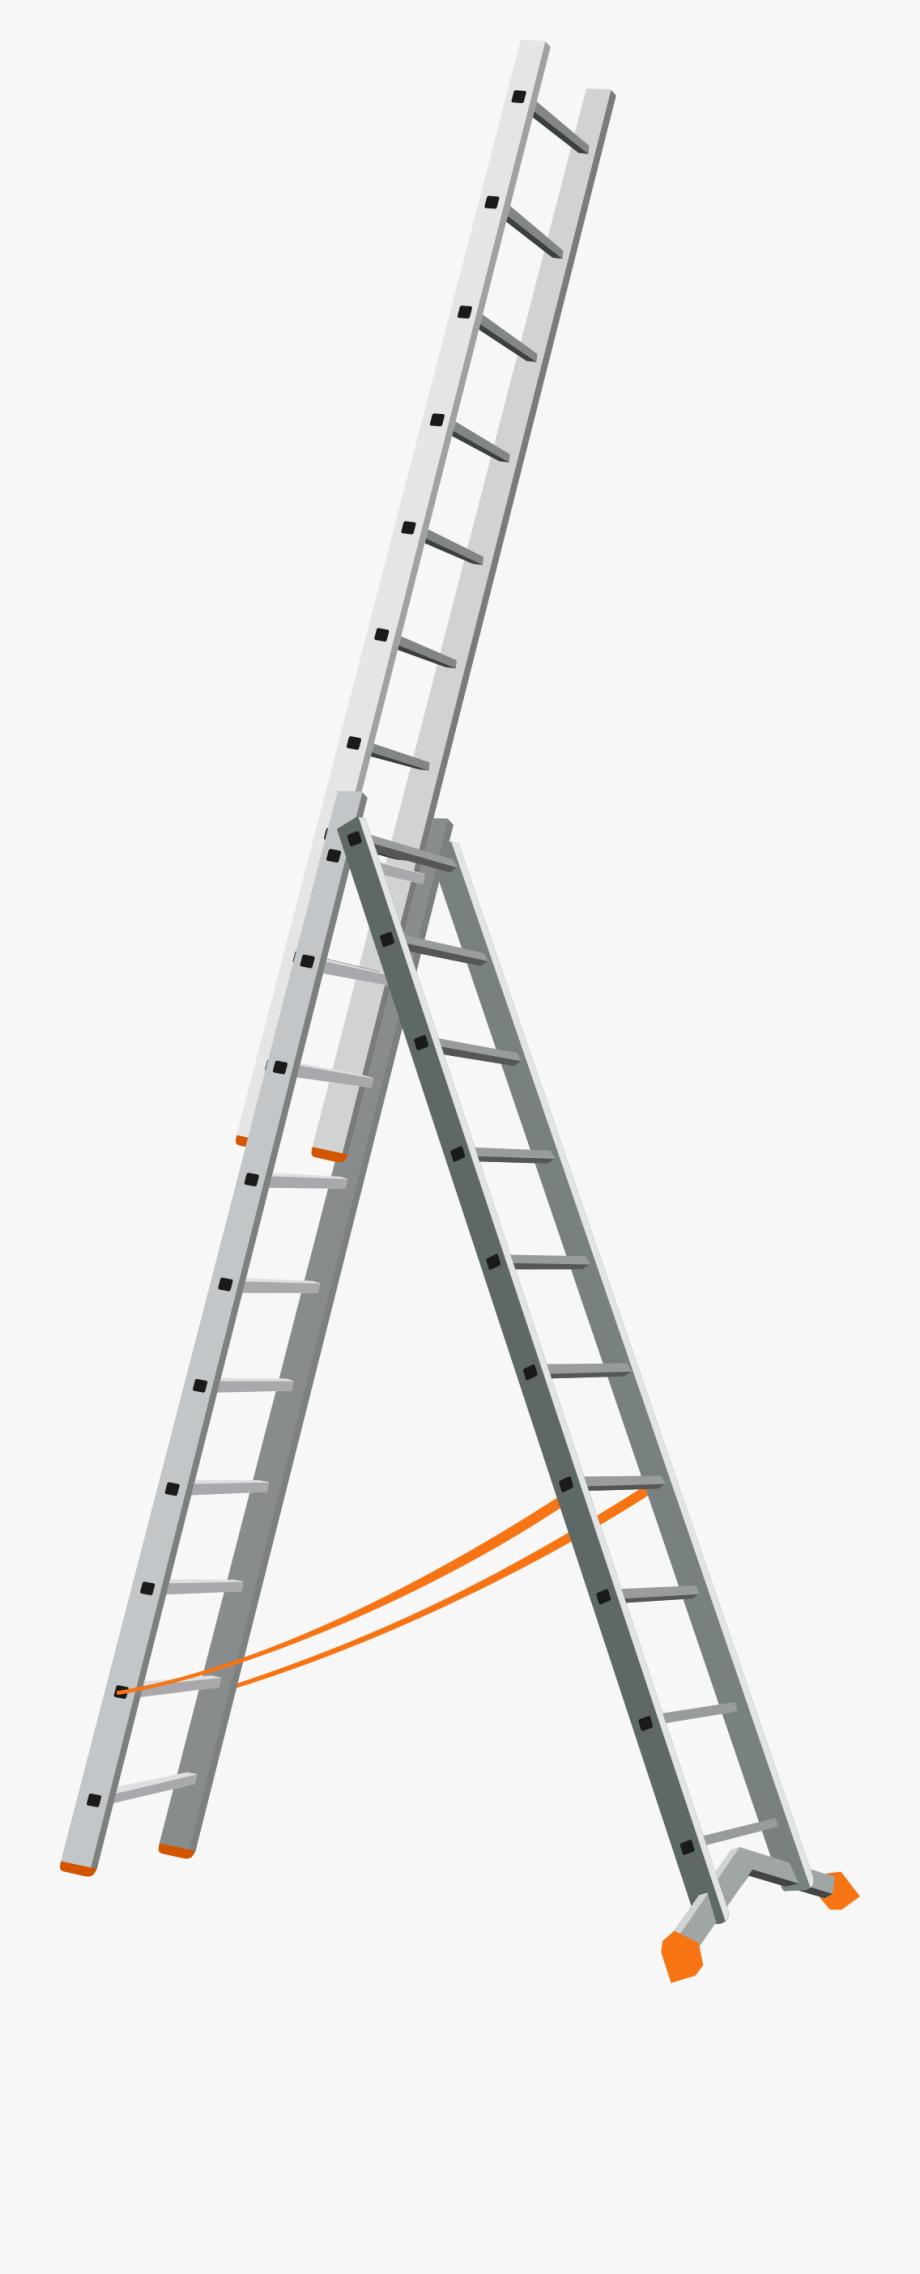 Ladder clipart extension ladder. Png